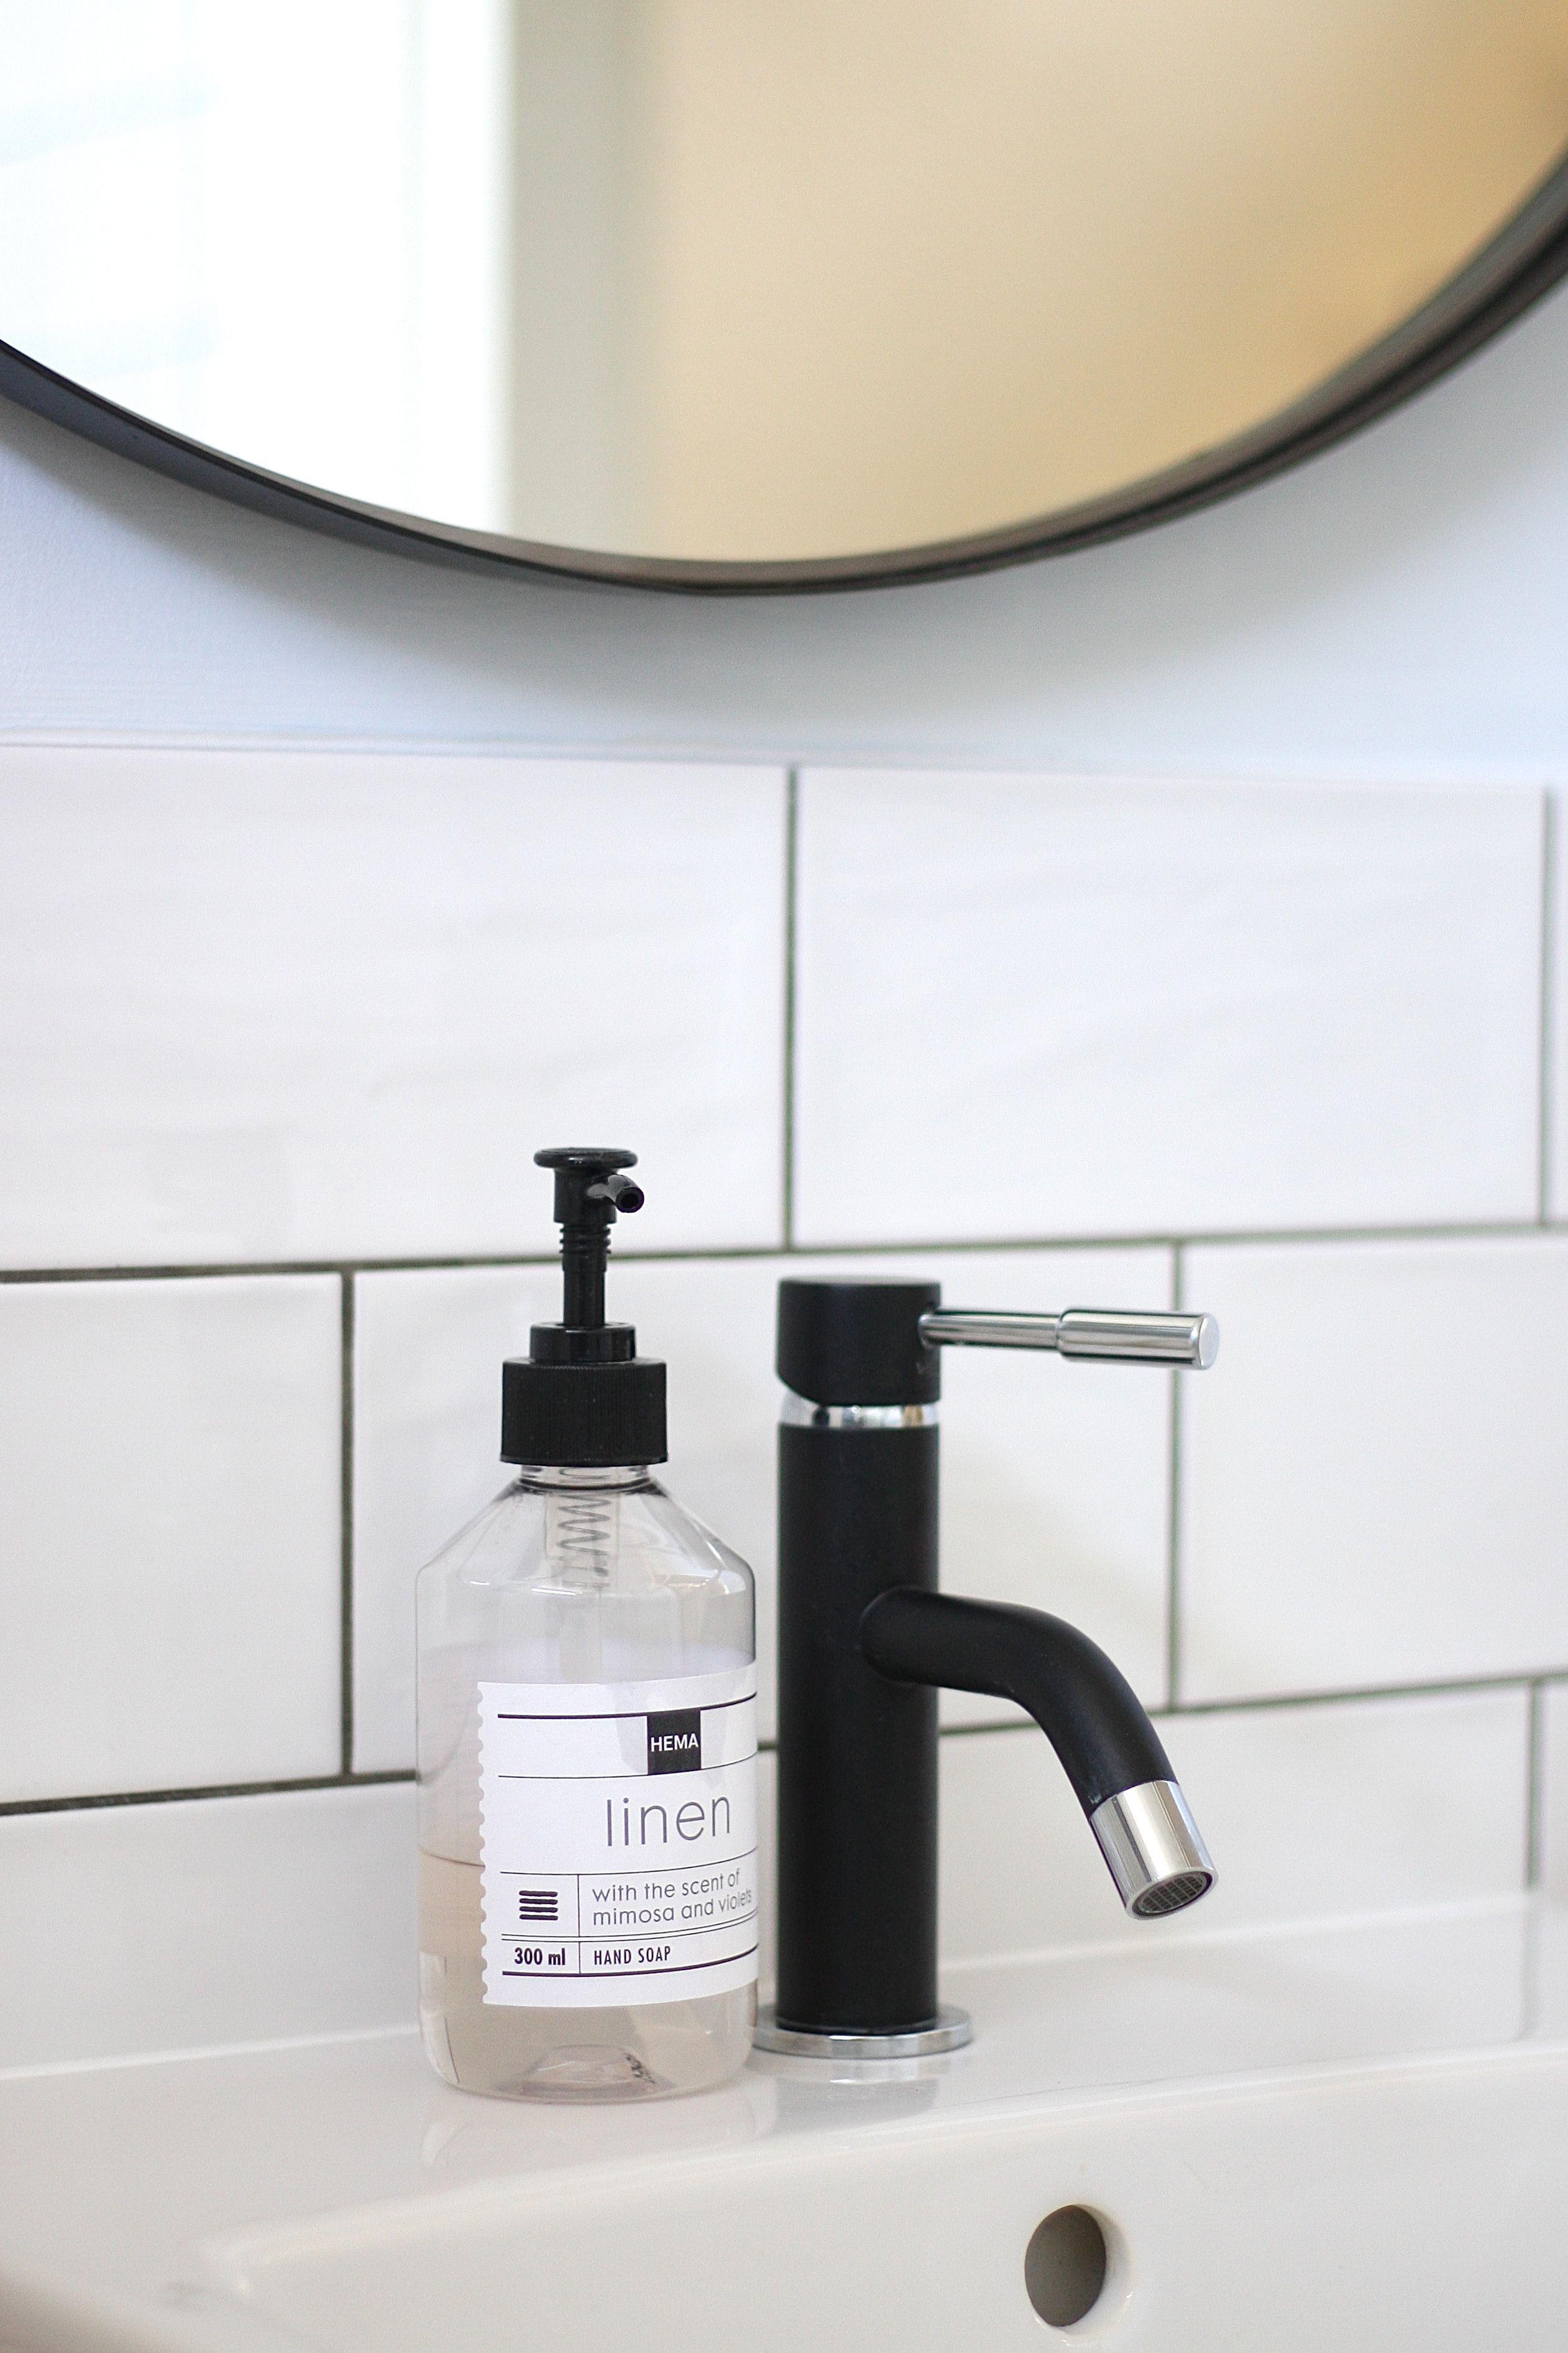 Badkamer zwarte kraan karwei hema handzeep metro for Badkamer kraan